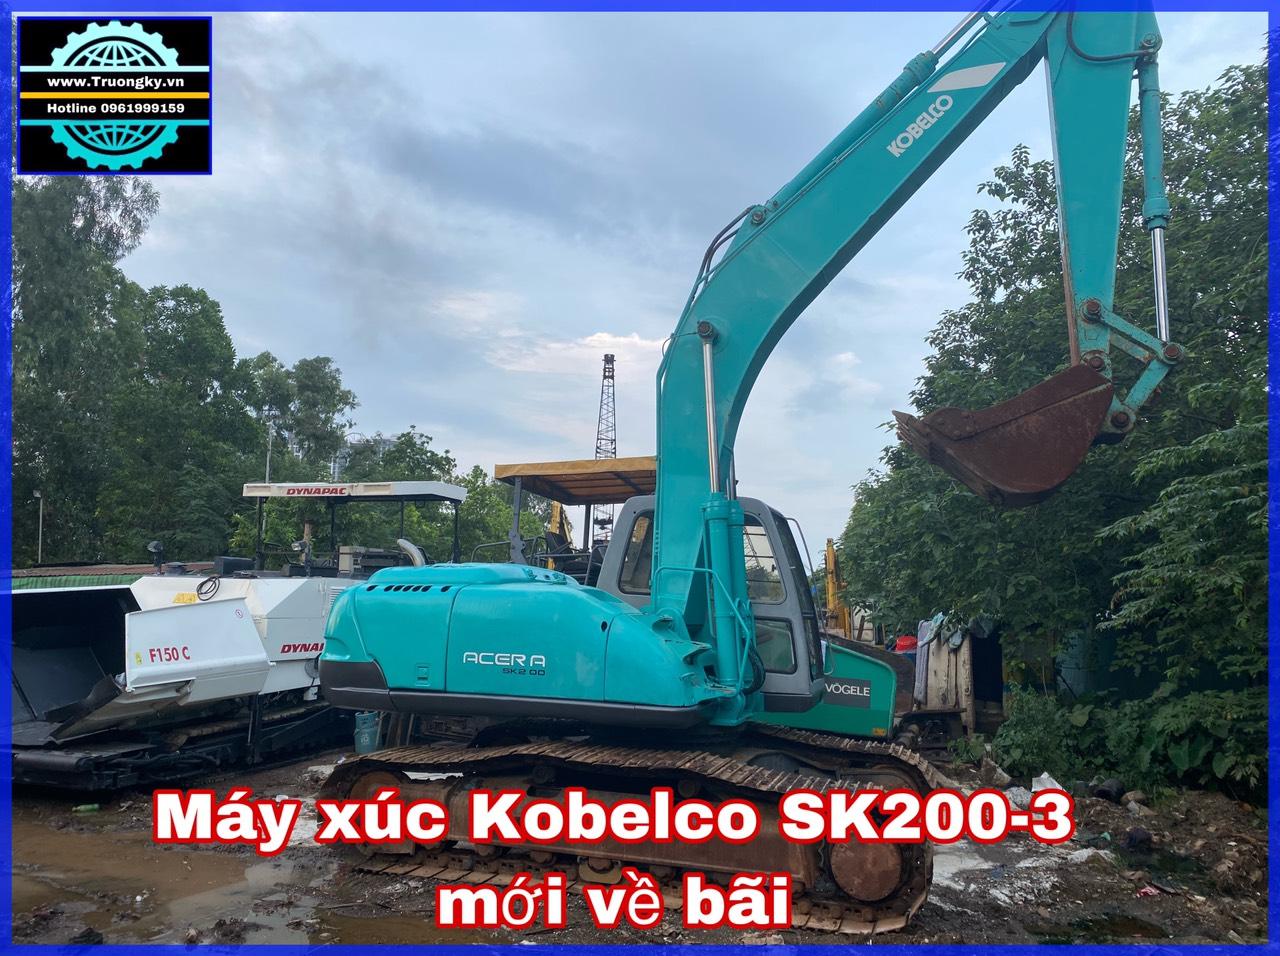 Máy xúc Kobelco SK200-3 (SOLD)